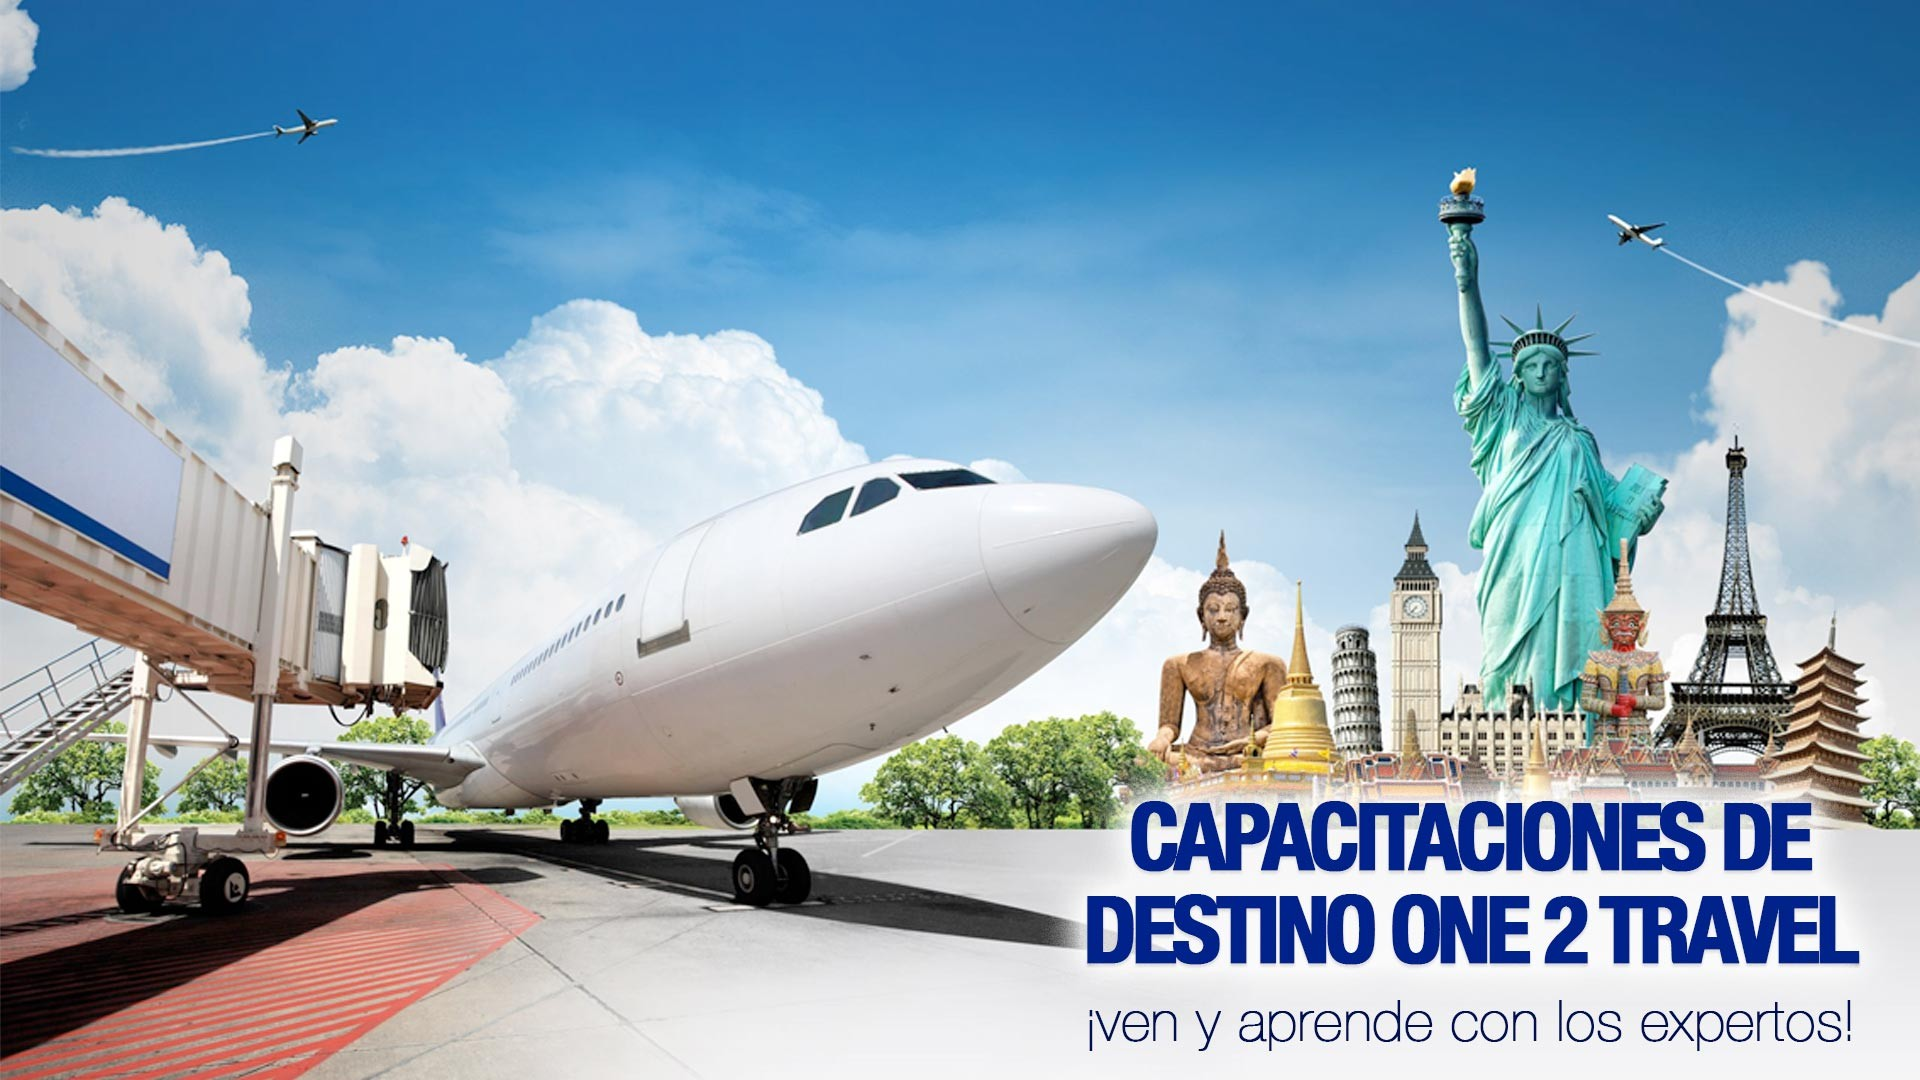 Capacitaciones de destino One2Travel